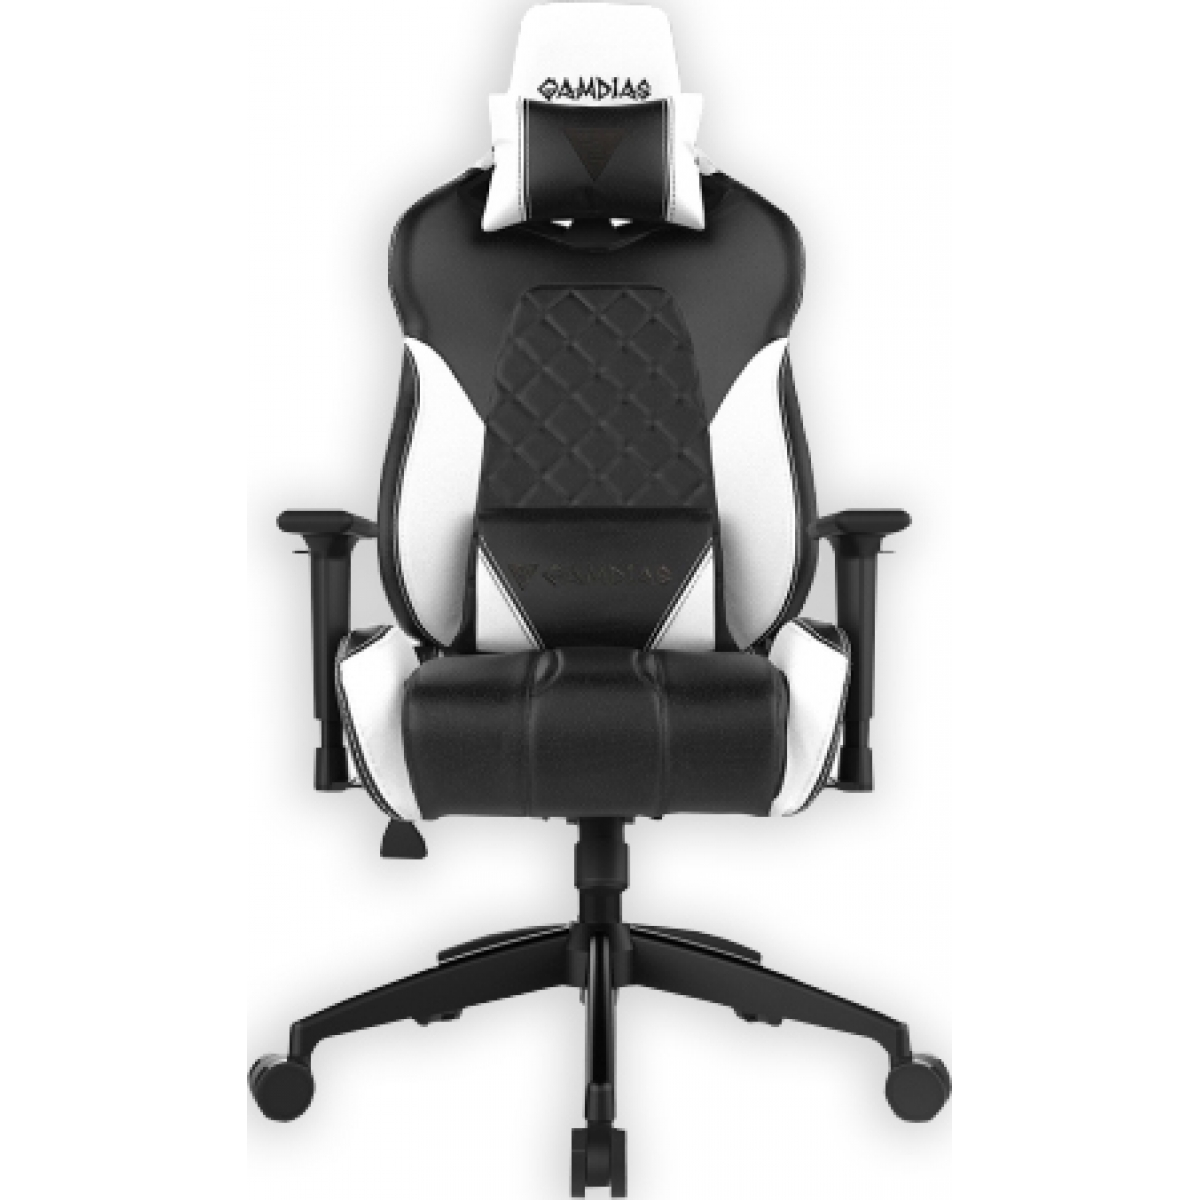 Cadeira Gamer Gamdias Achilles RGB E1 L, Black-White, GD-ACHILLESE1LBW